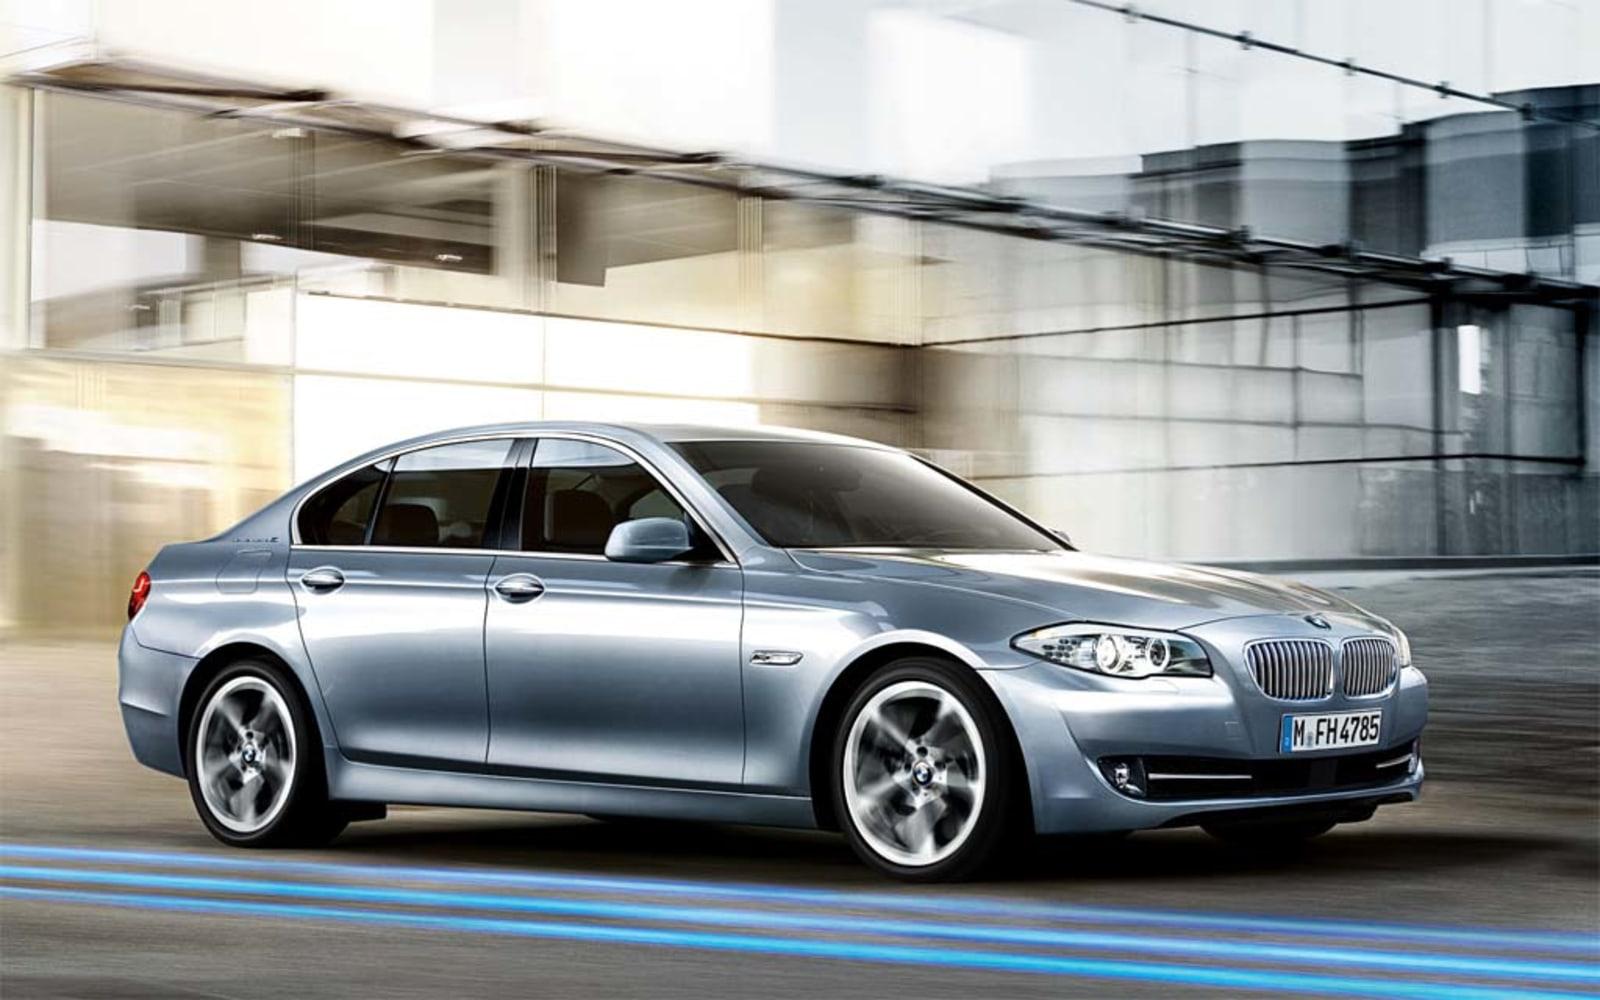 BMW recalls 134000 luxury sedans over tail lightproblem  NBC News